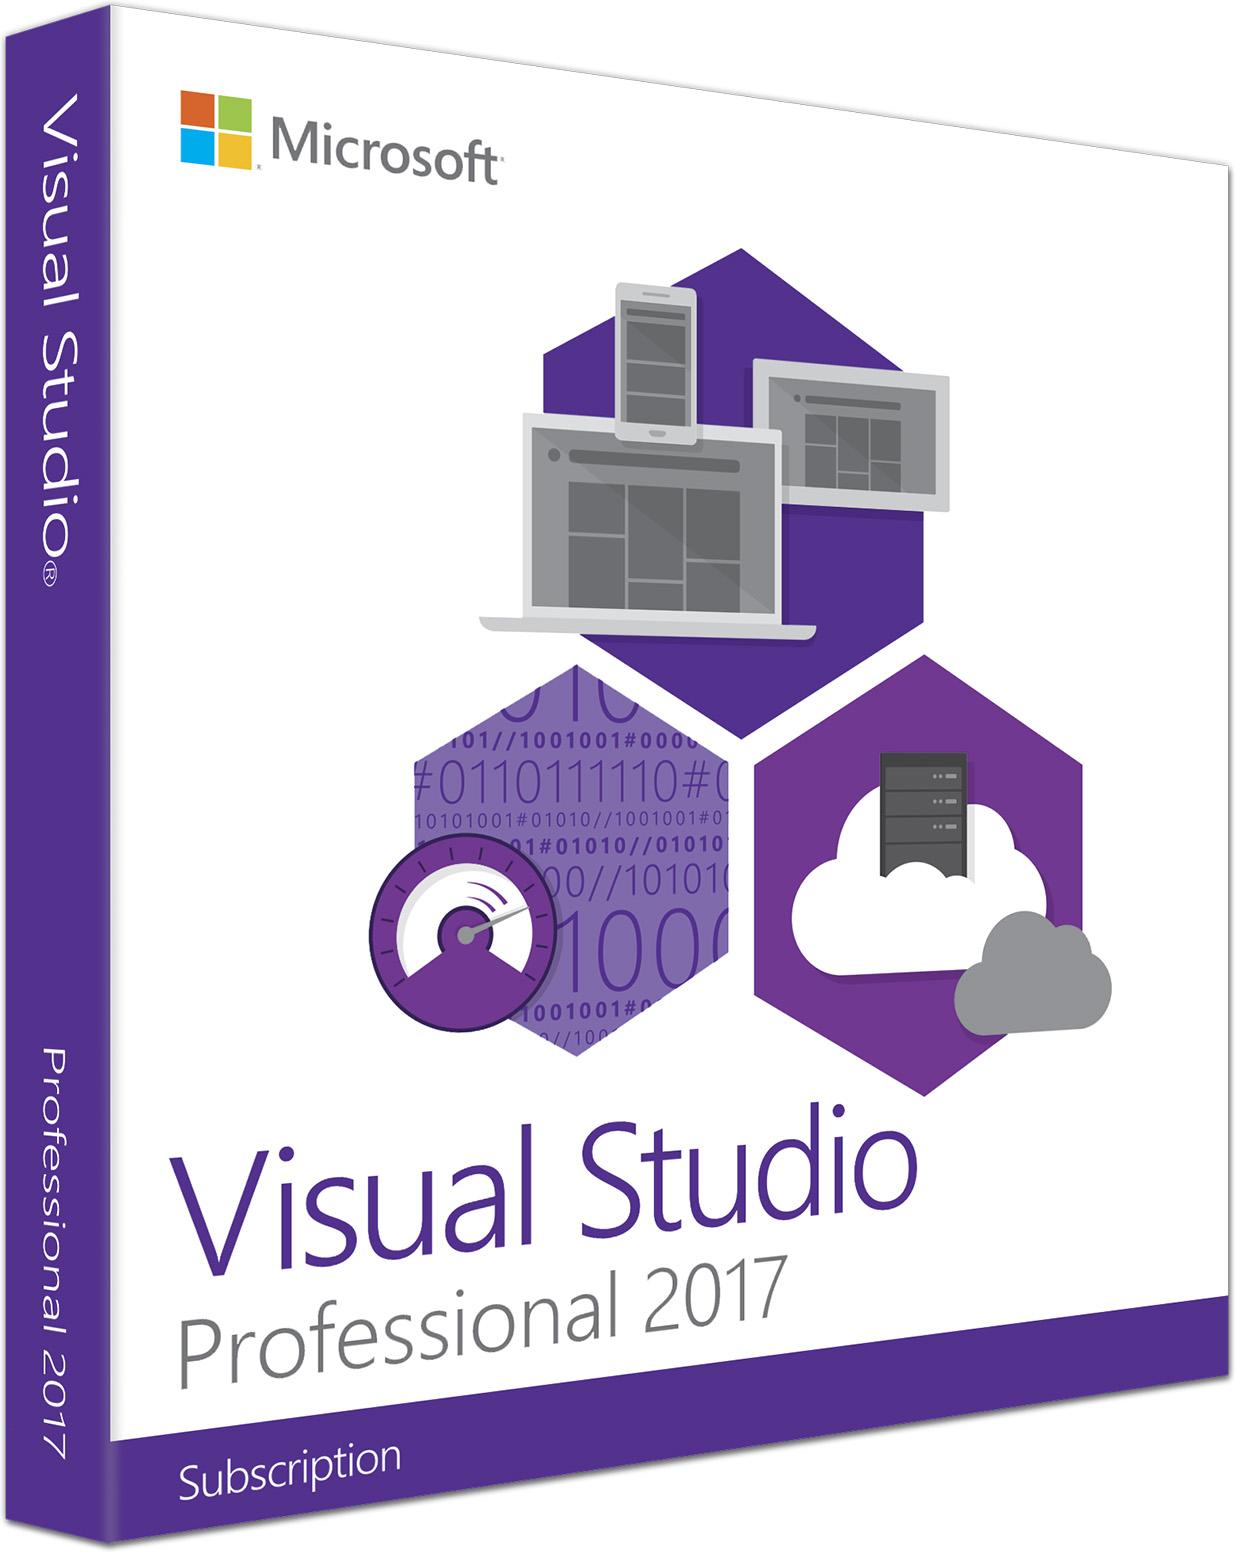 Visual Studio Professional Subscription